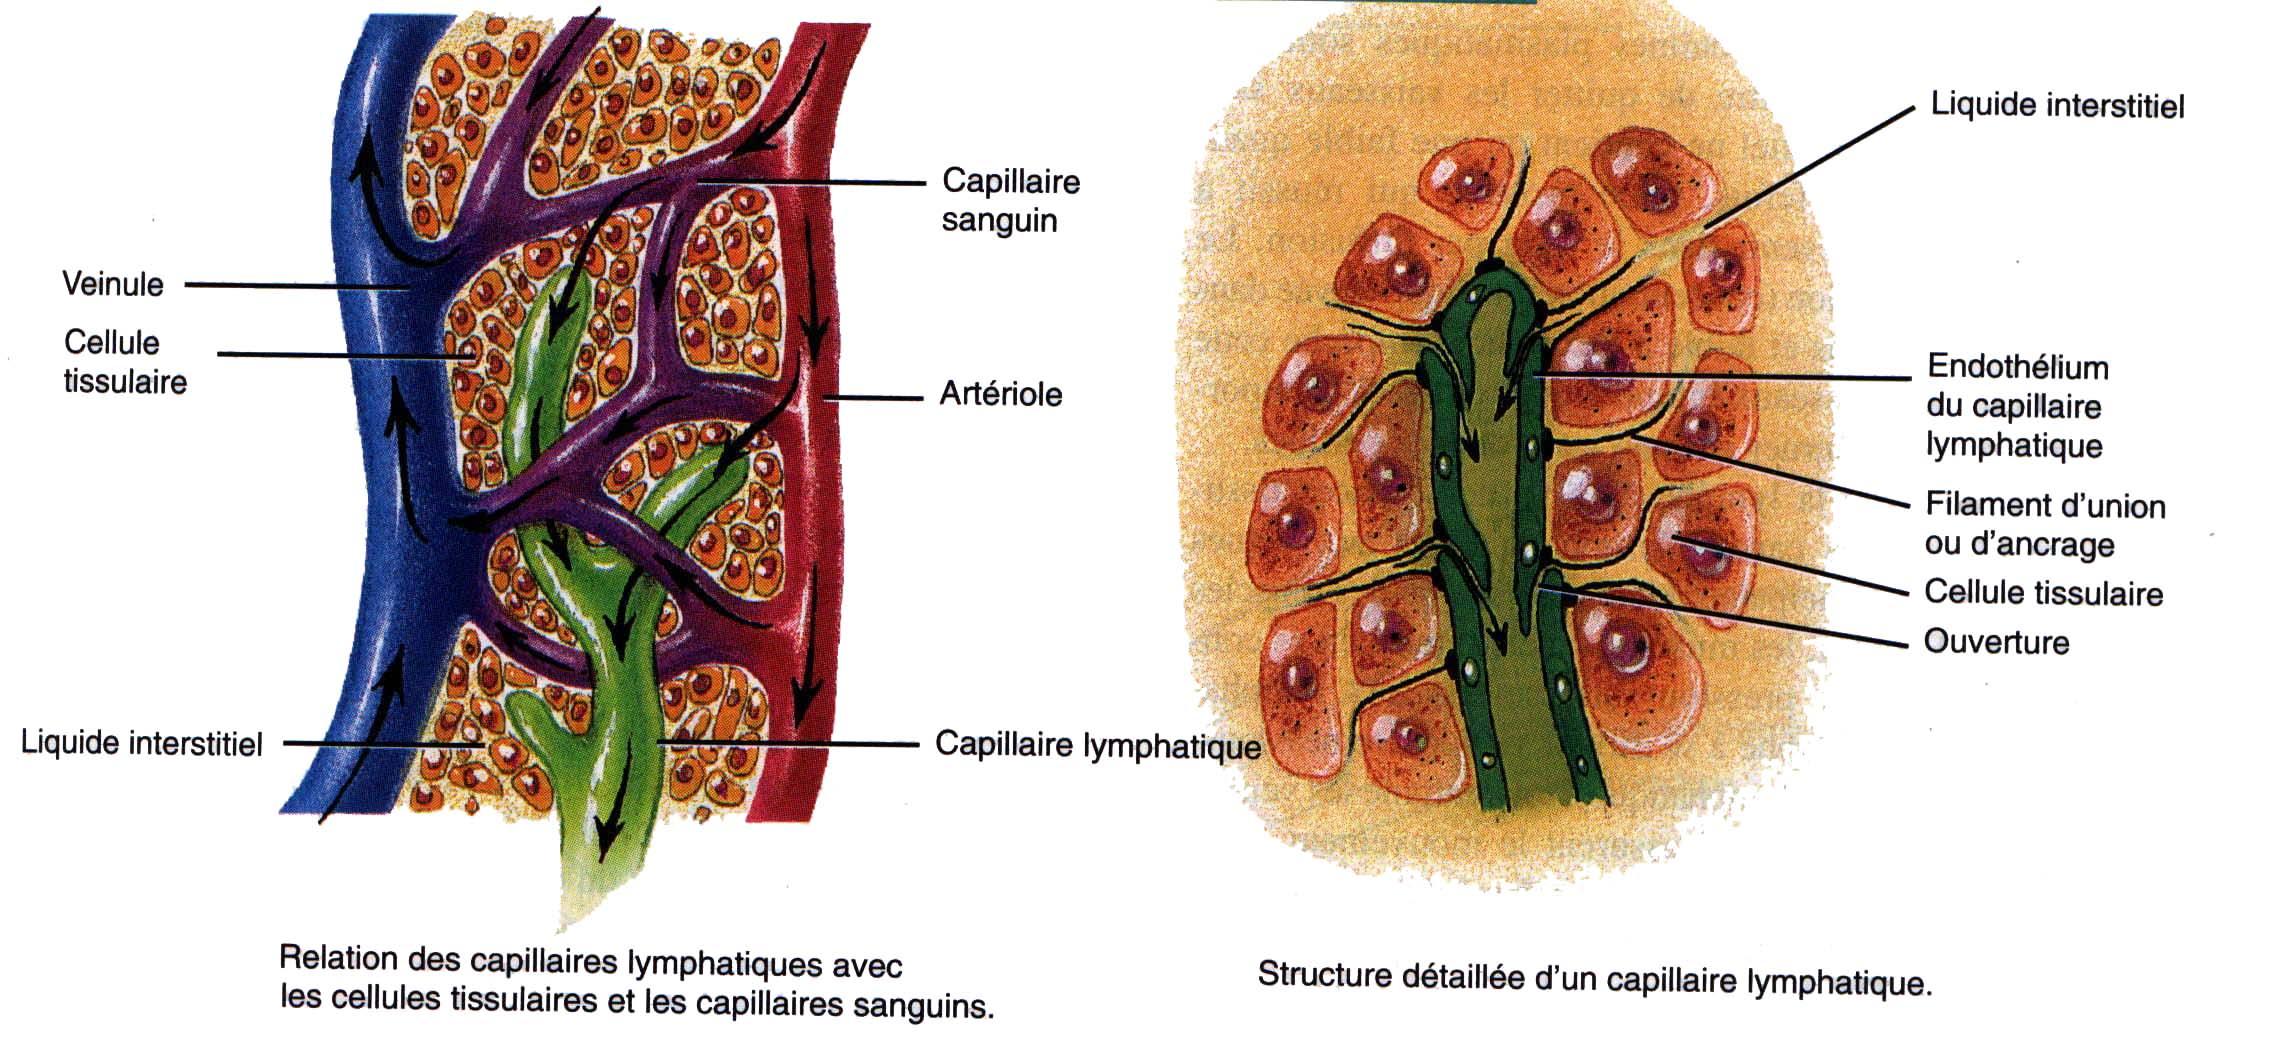 ganglionlymphatique.jpg - Le système lymphatique - inspirezvous.over-blog.com